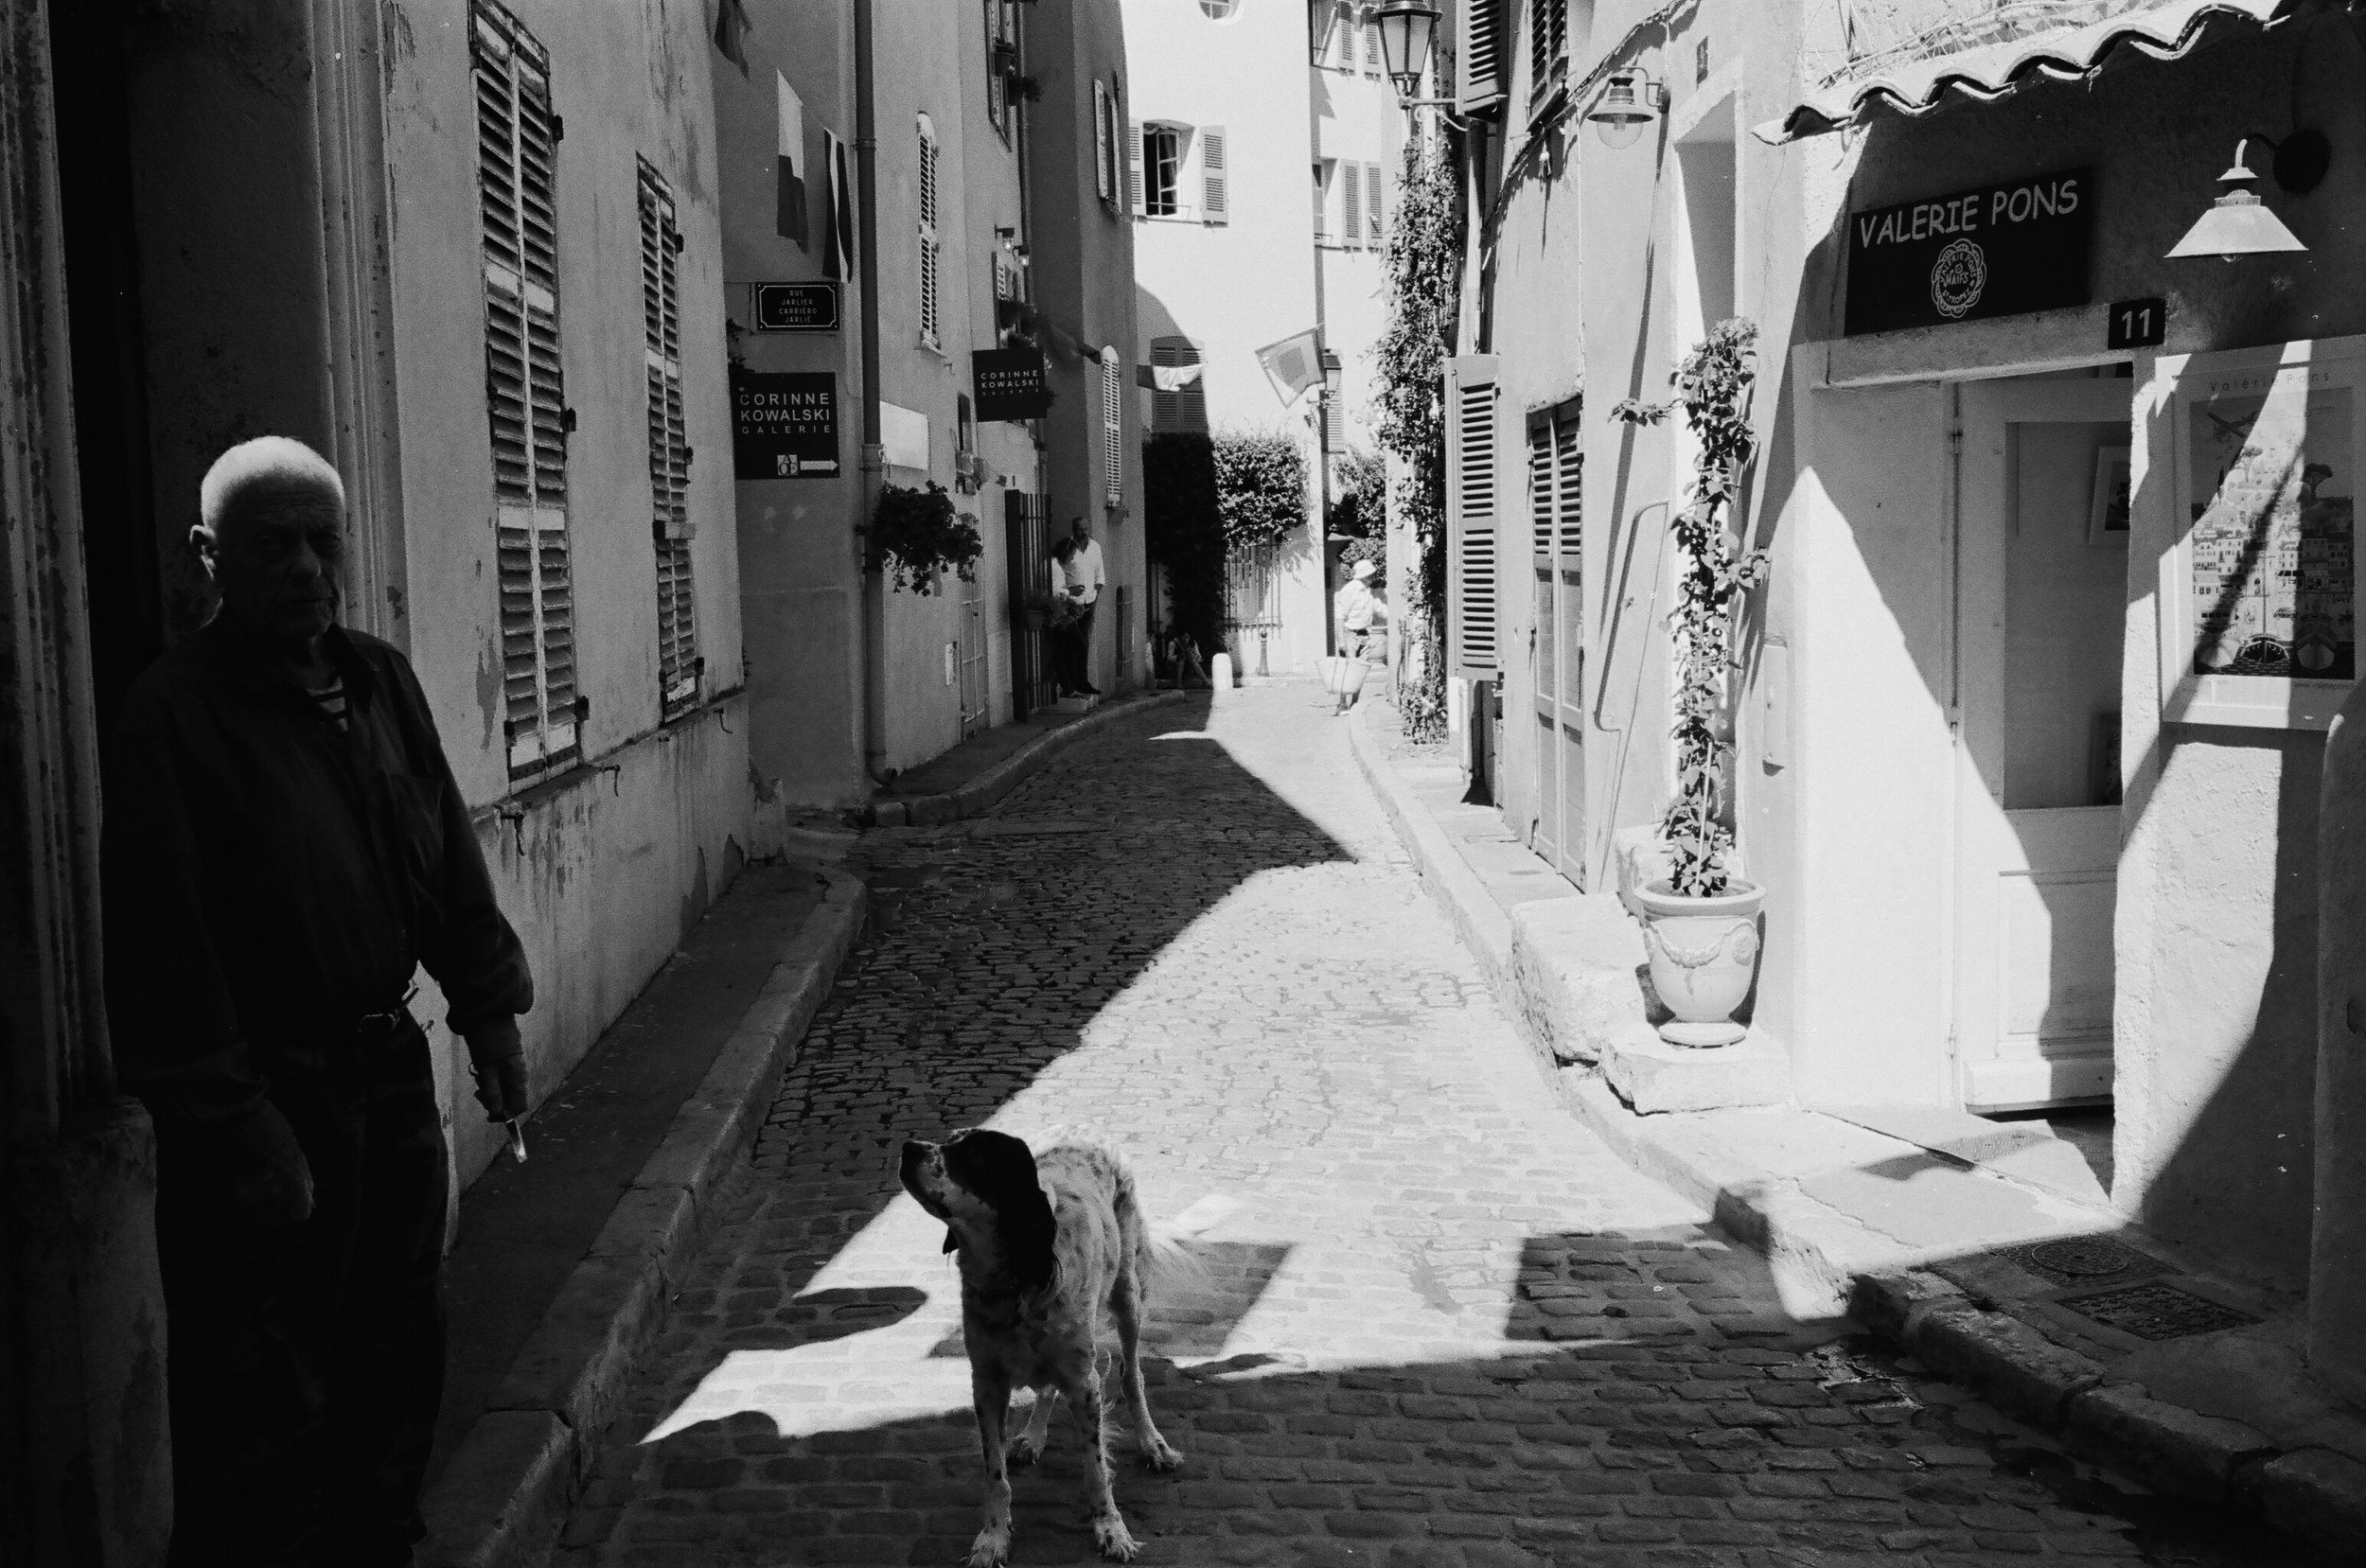 A strange figure and its dog, St. Tropez. France. 2016.